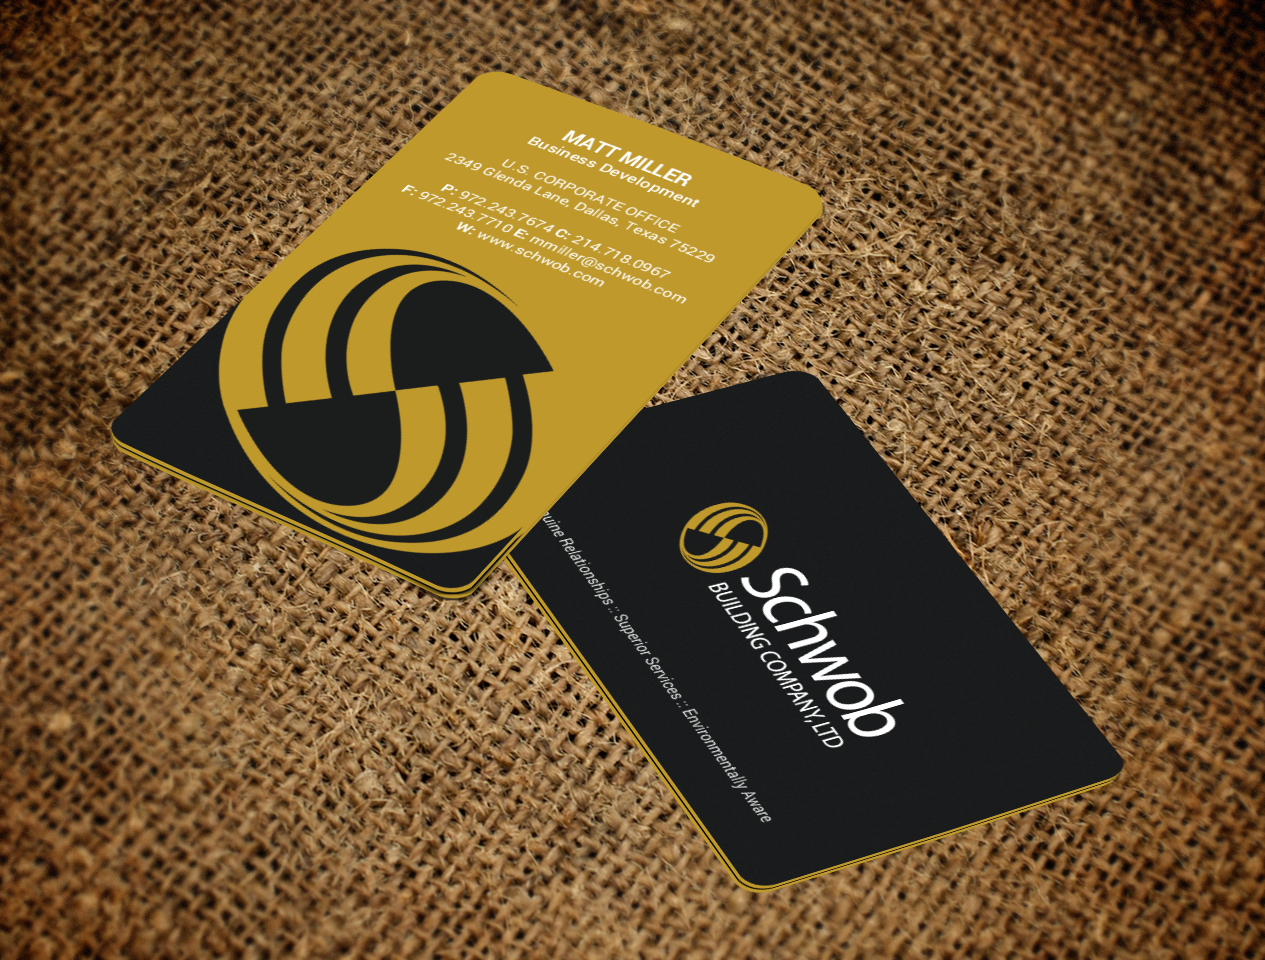 Bold serious construction company business card design for schwob bold serious construction company business card design for schwob companies in united states design 17059591 colourmoves